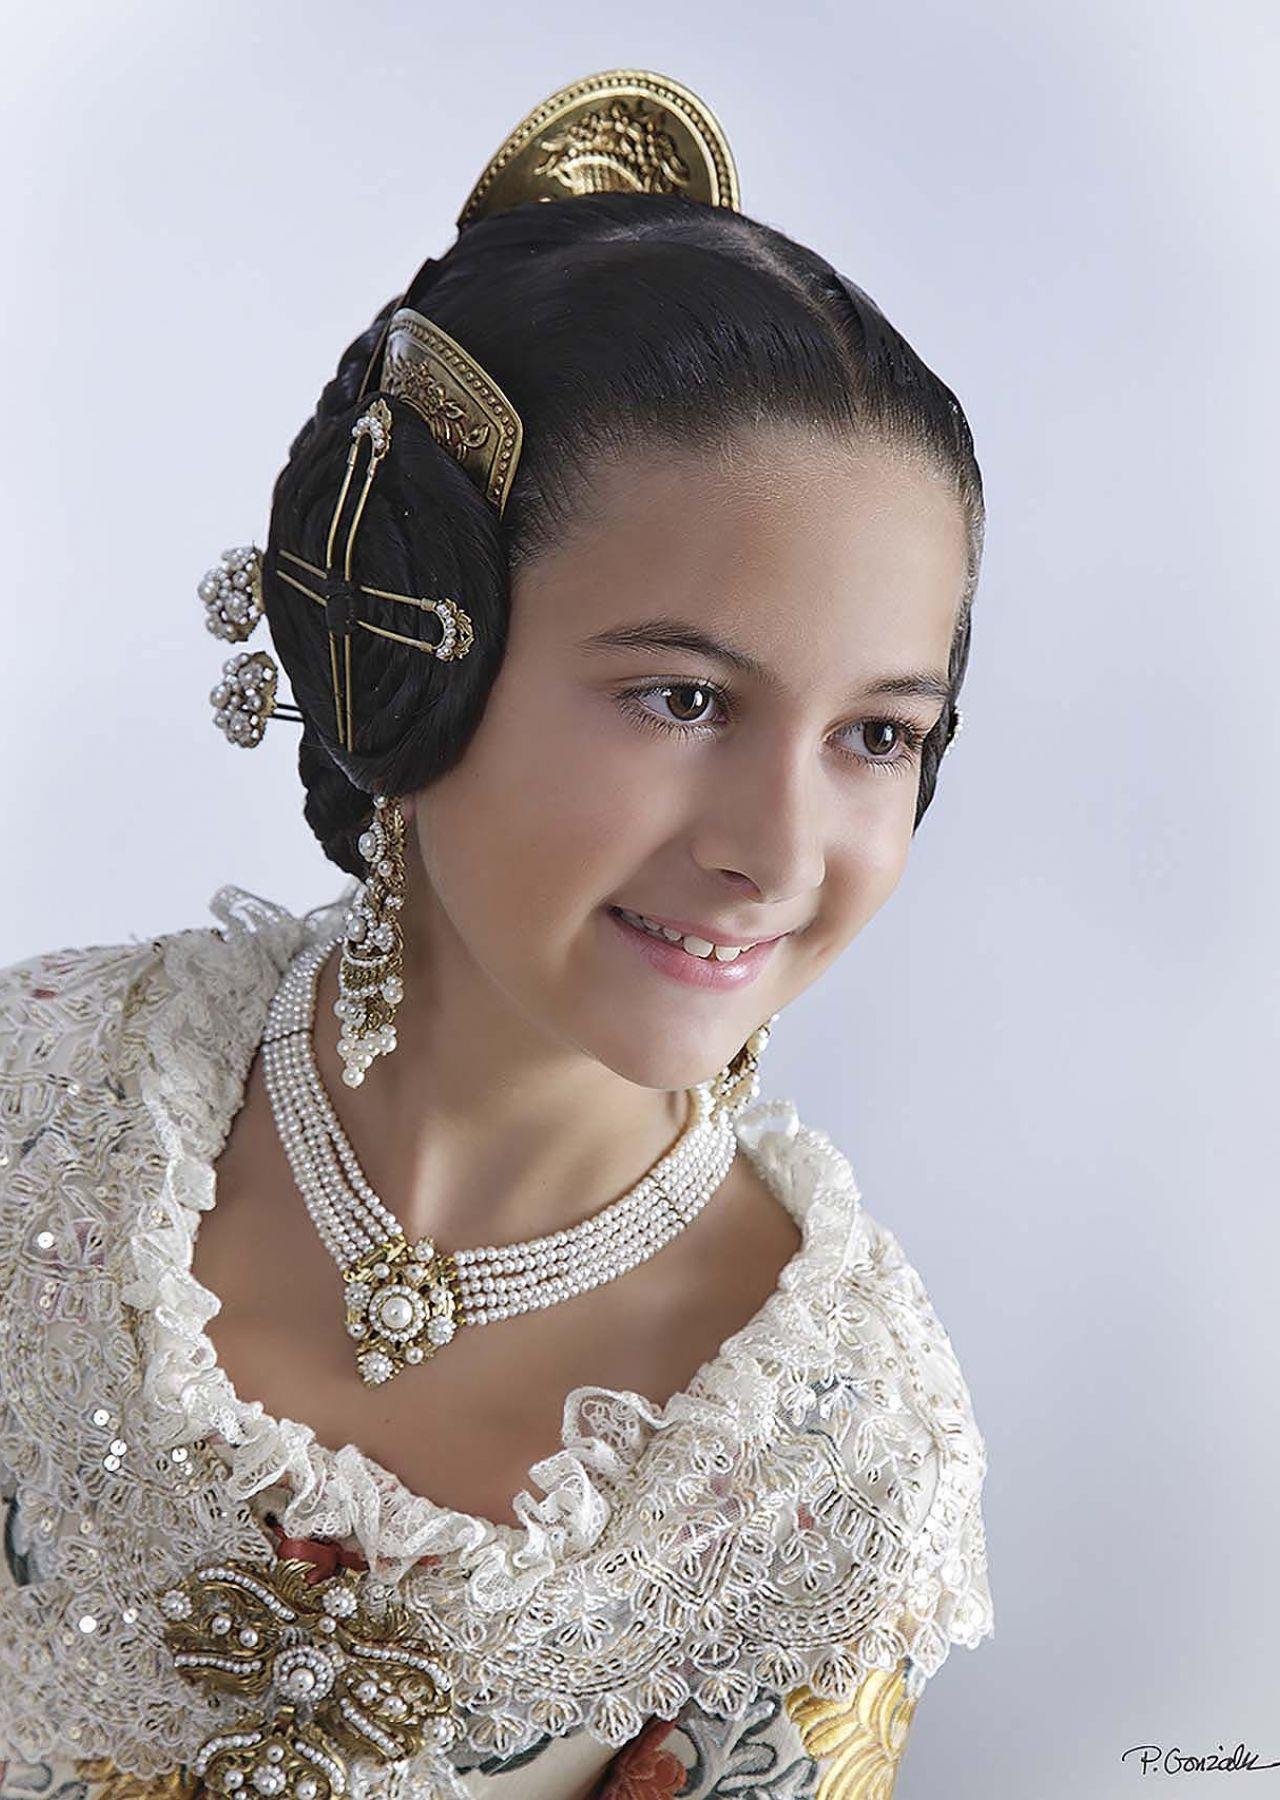 Rocío Martínez Tormo Figueres